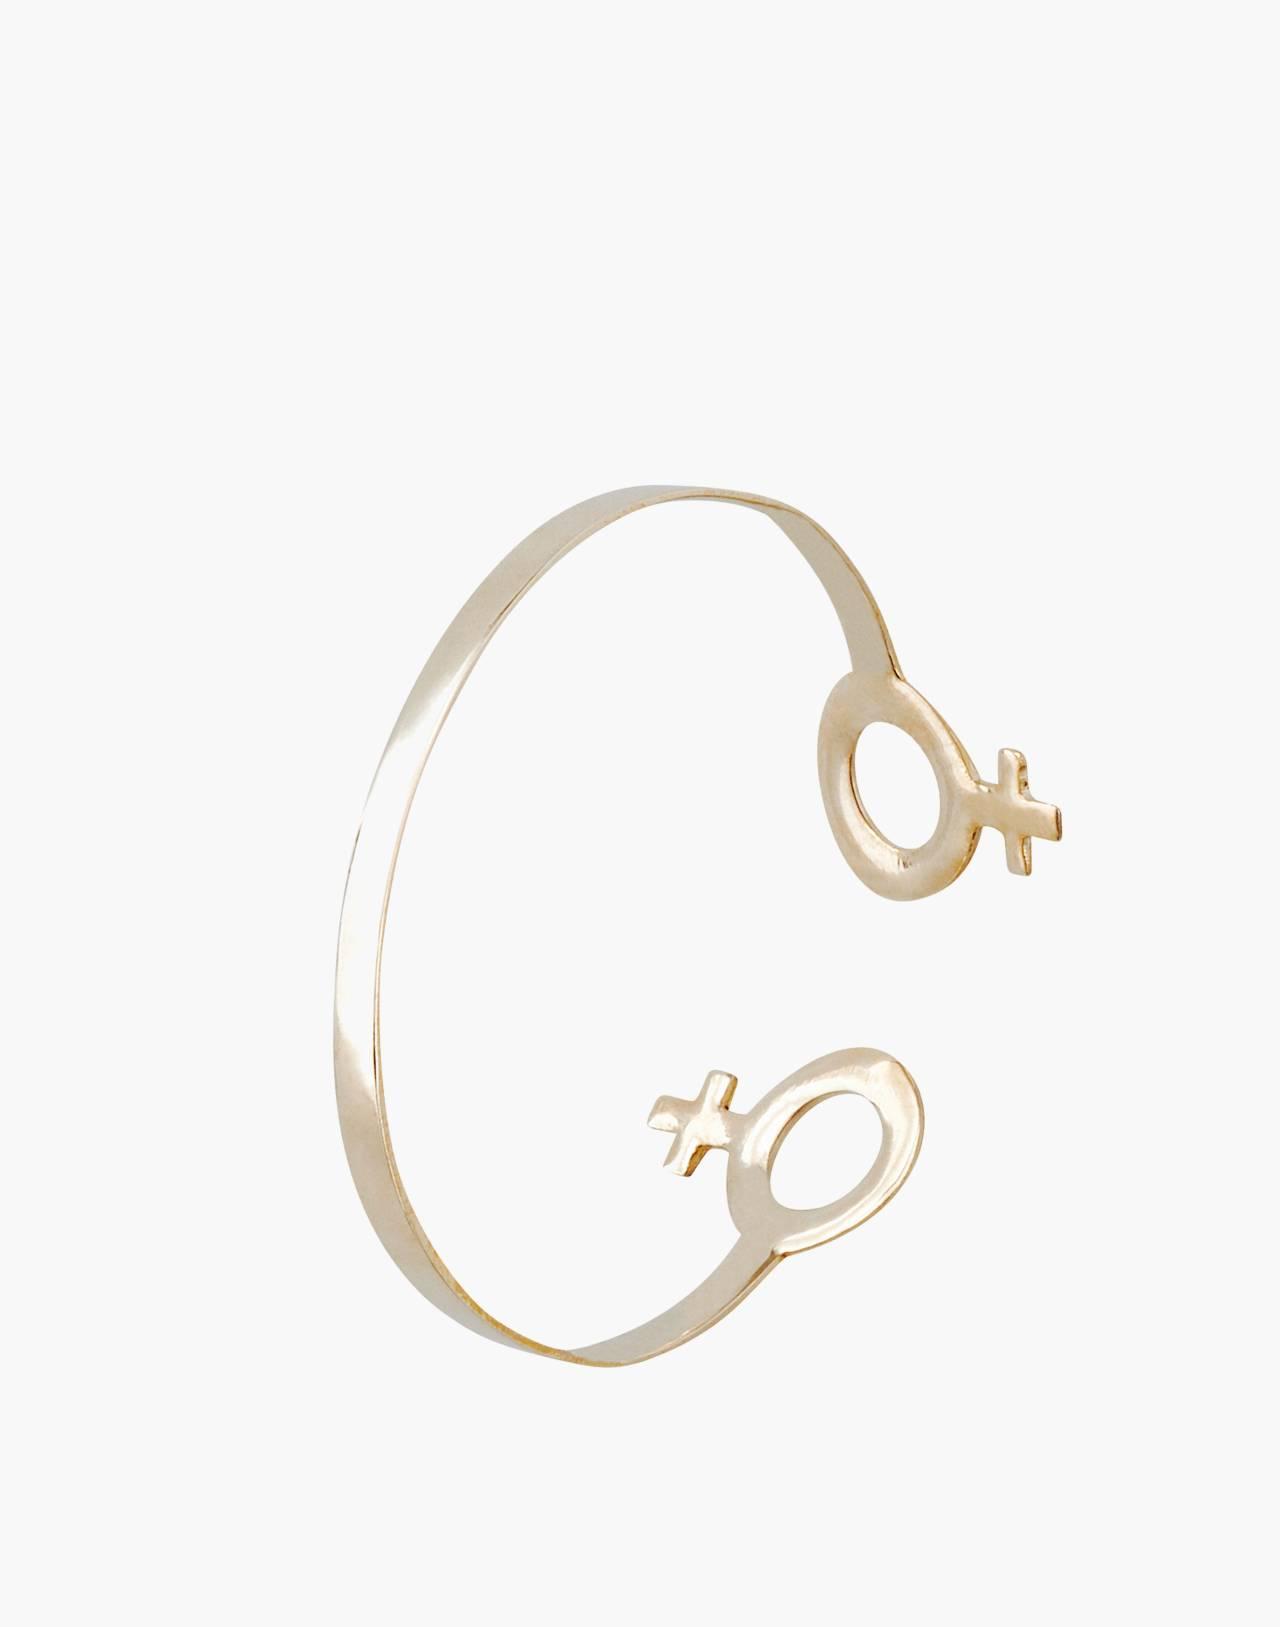 Charlotte Cauwe Studio Brass Female Cuff Bracelet in gold image 3